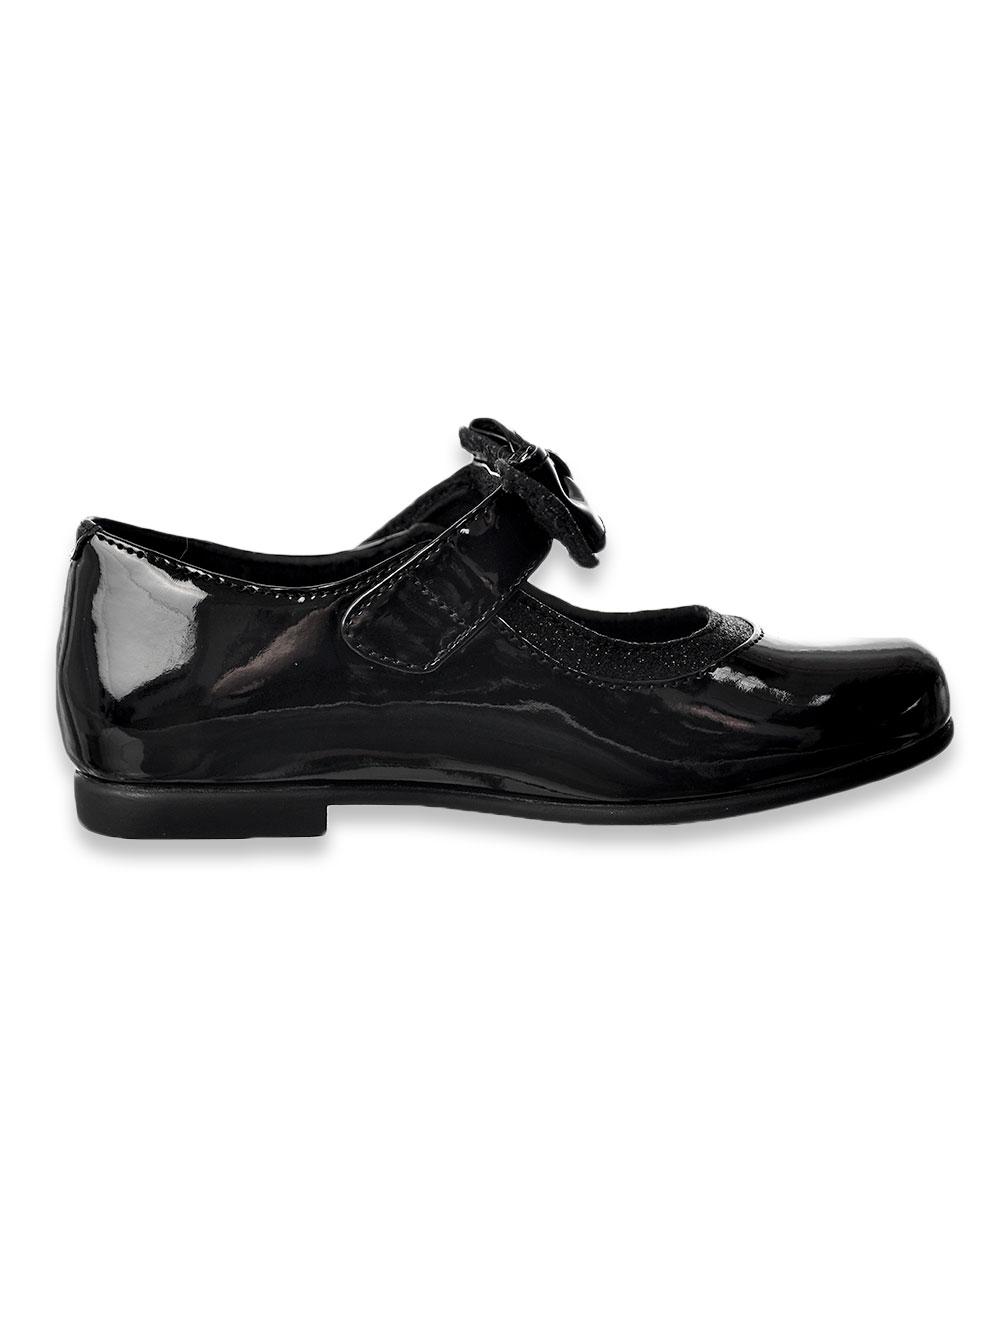 Sizes 5-10 Rachel Girls/' Penny Mary Jane Flat Shoes